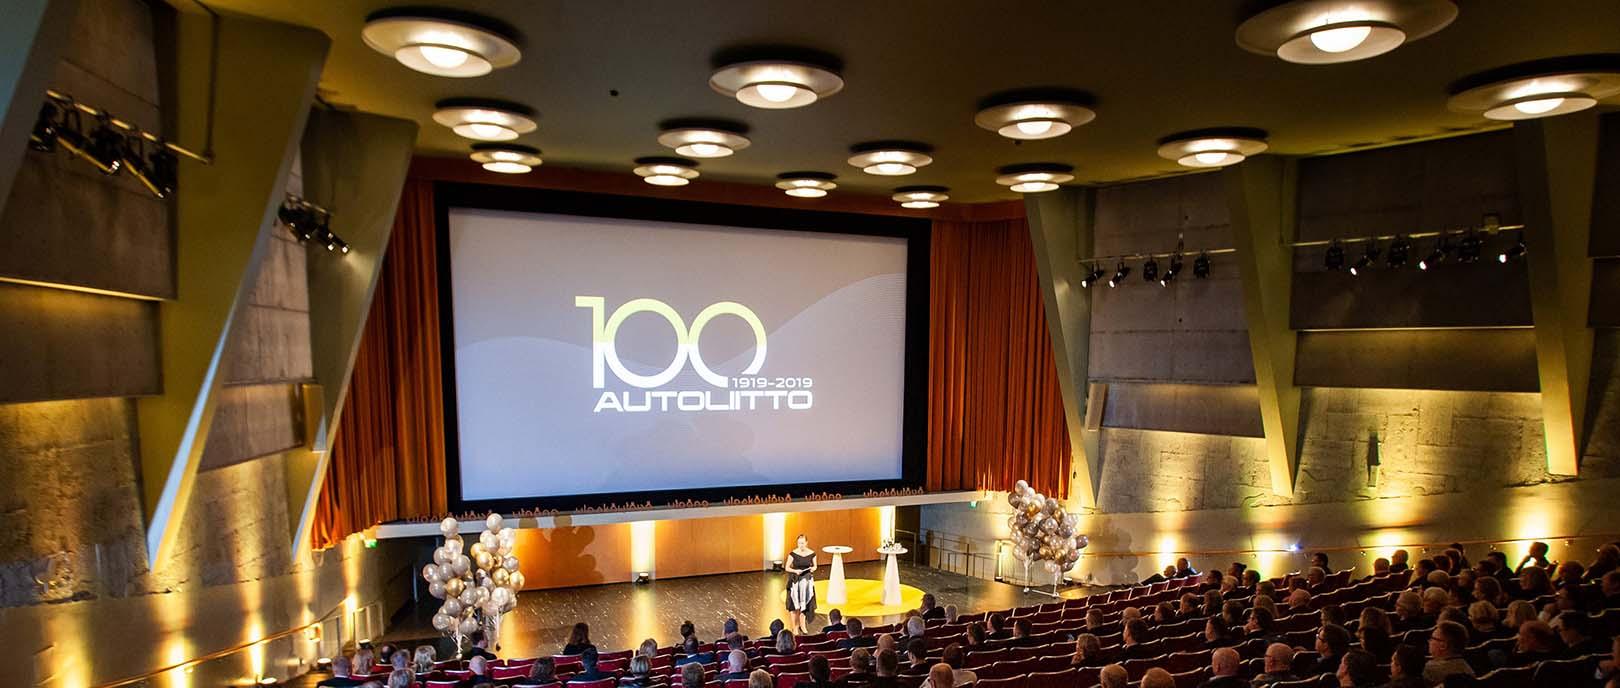 autoliitto-100v-stage